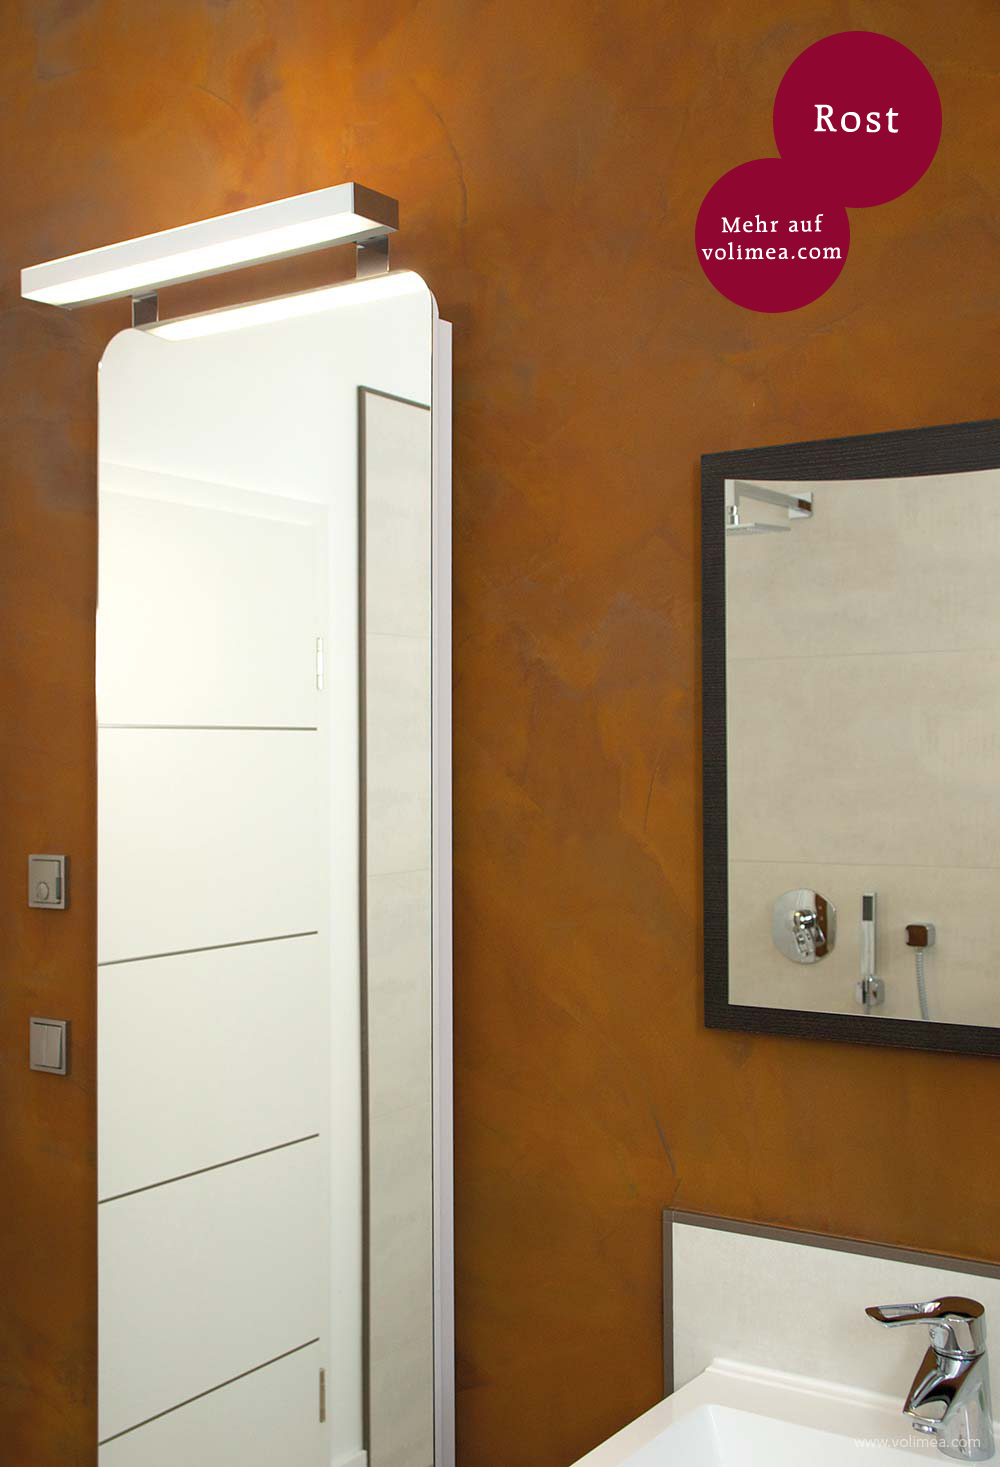 Grandezza Wandbeschichtung Waschtisch - Rost